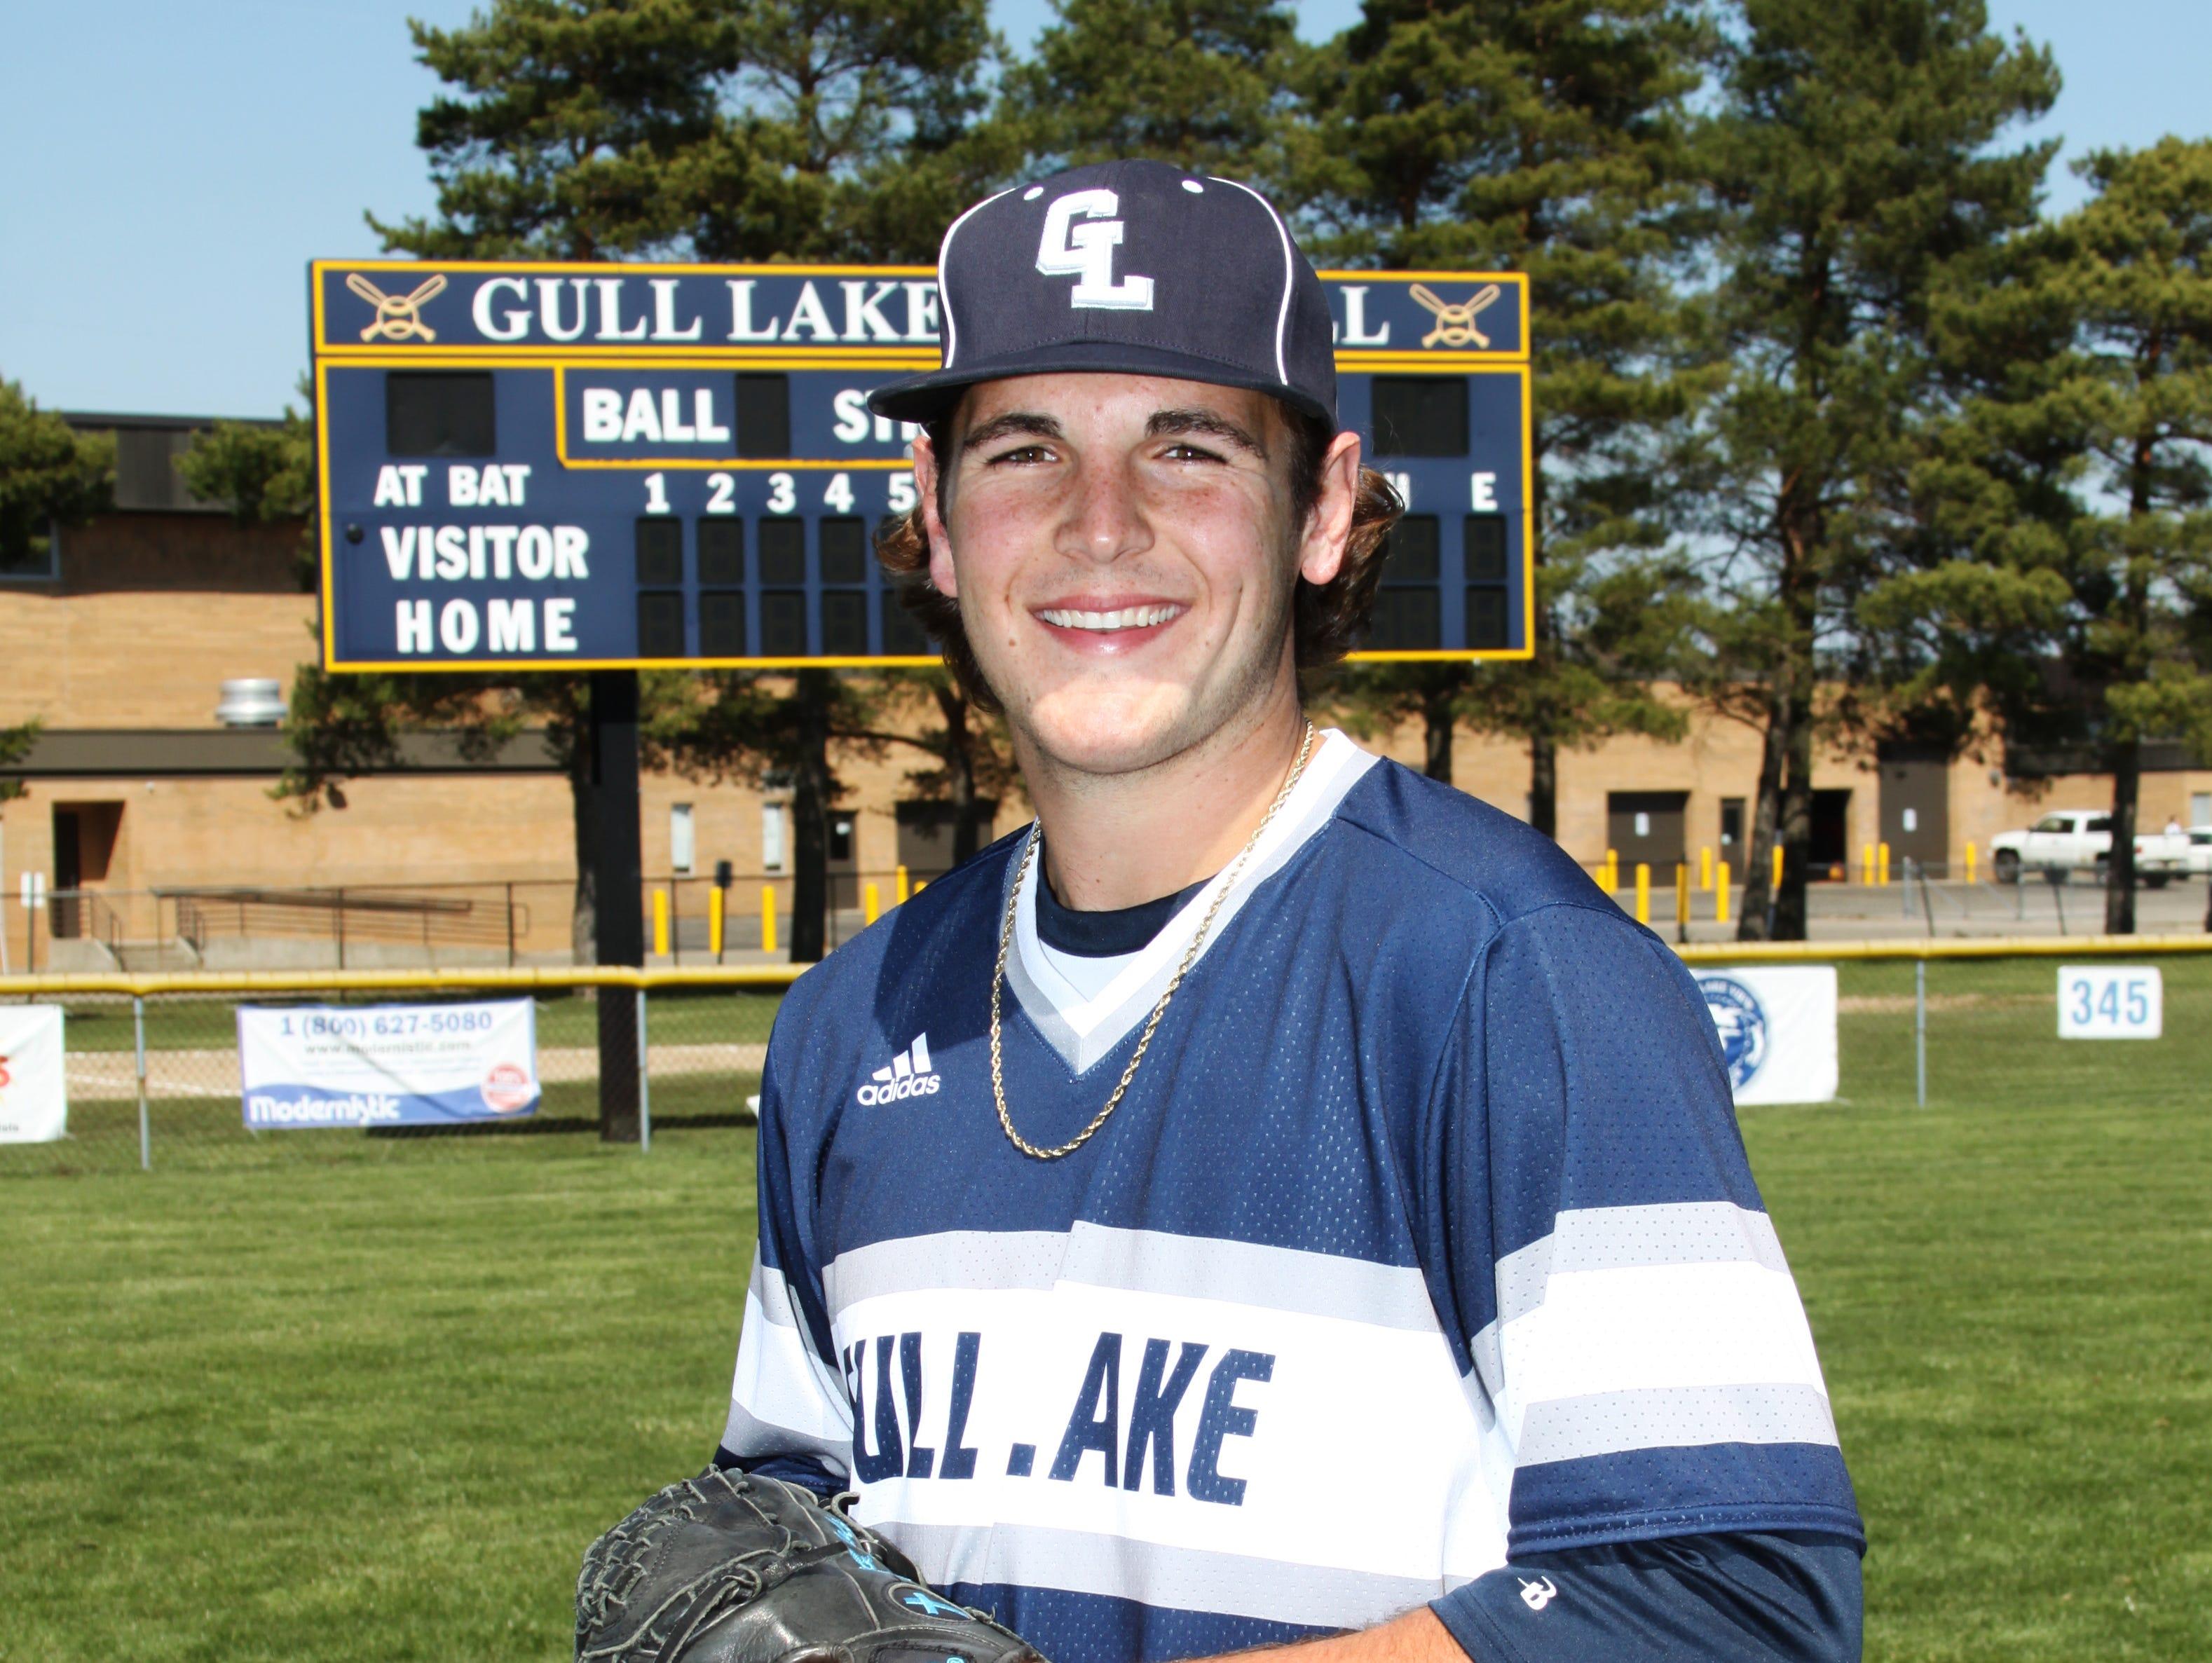 Gull Lake's Caleb Scoles will be playing at University of Toledo next year.